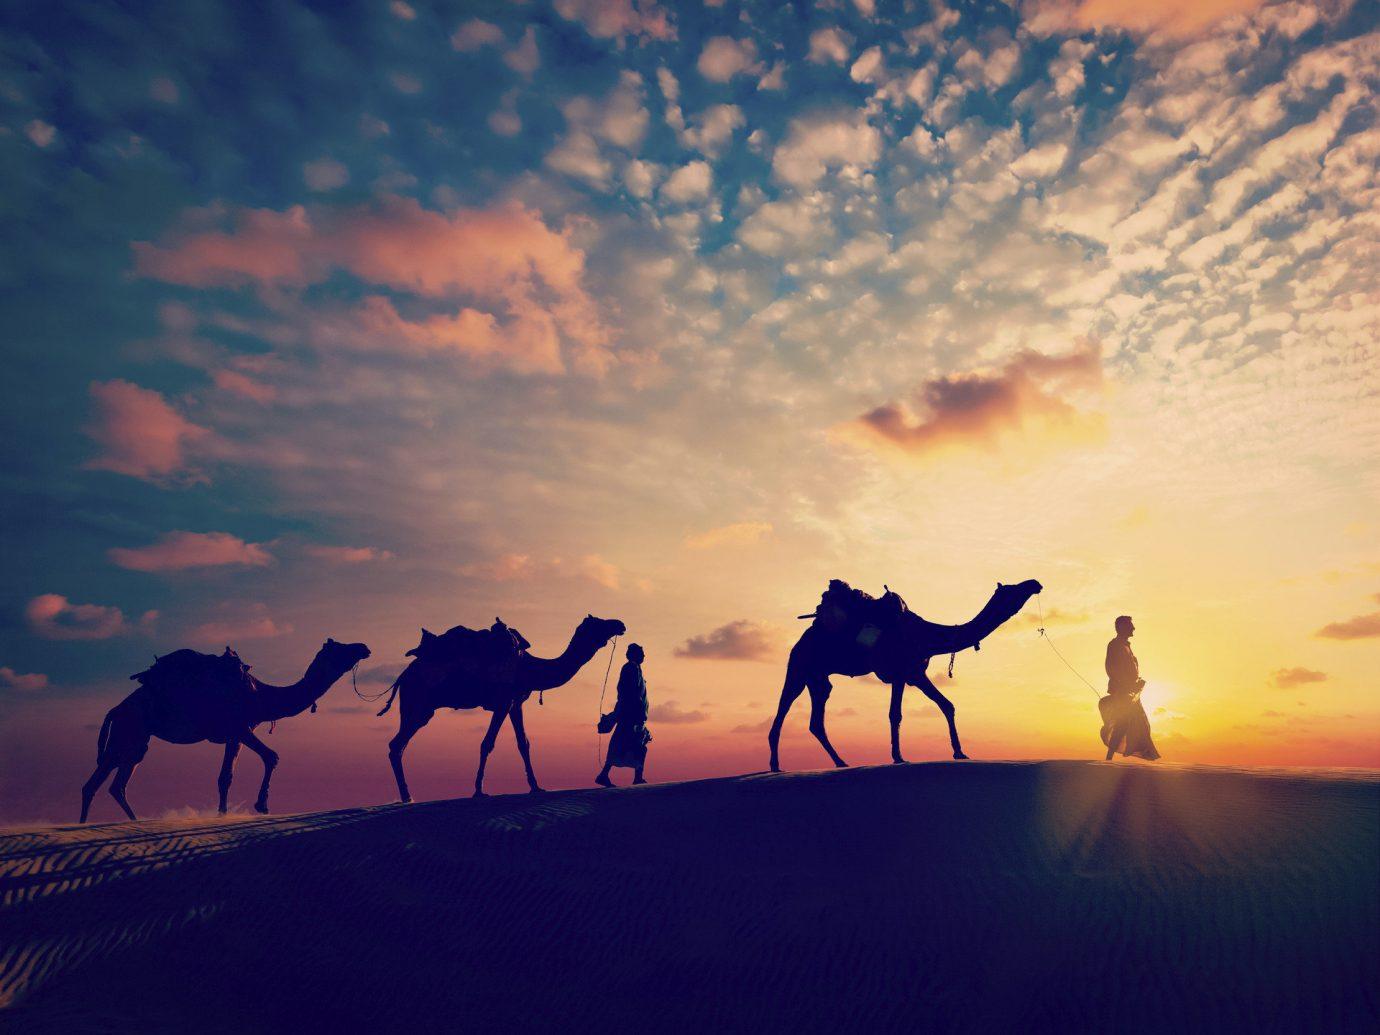 Trip Ideas sky outdoor natural environment Sunset Camel landscape morning sunrise evening plain dawn dusk horse like mammal Desert camel like mammal clouds